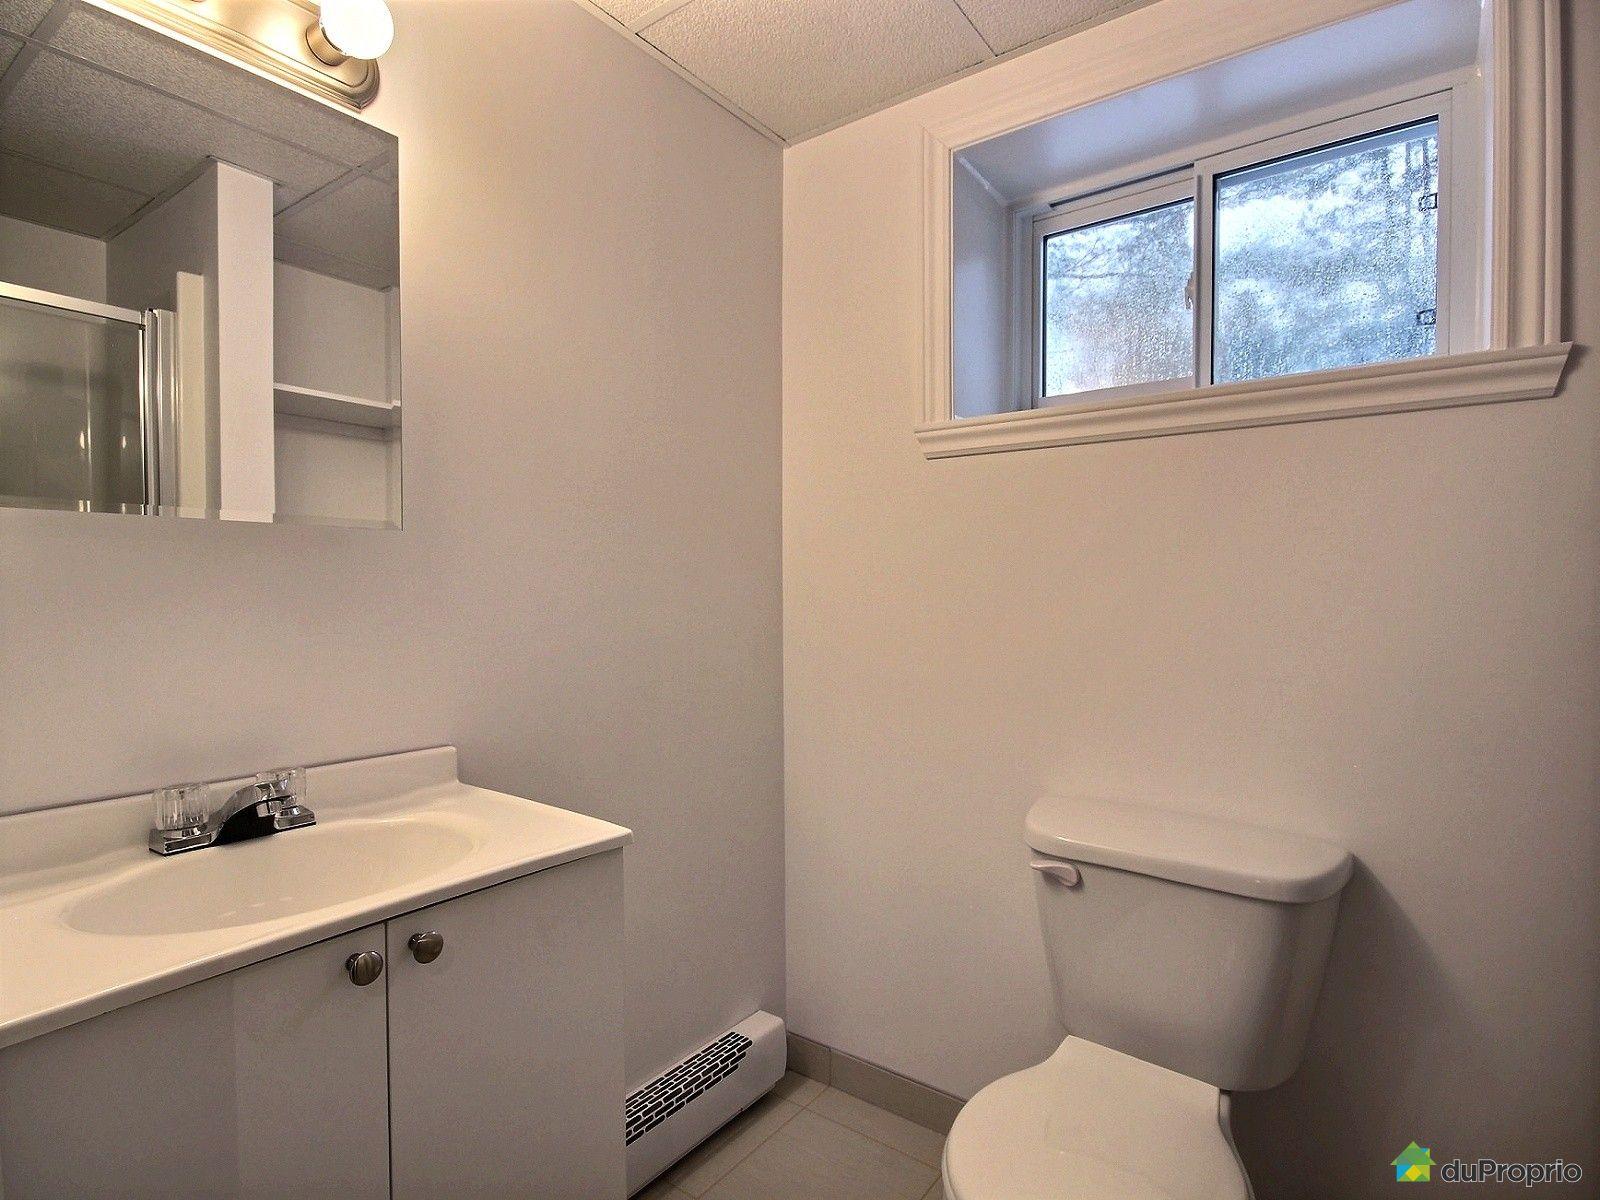 Maison vendu mercier immobilier qu bec duproprio 680633 for Reno salle de bain quebec